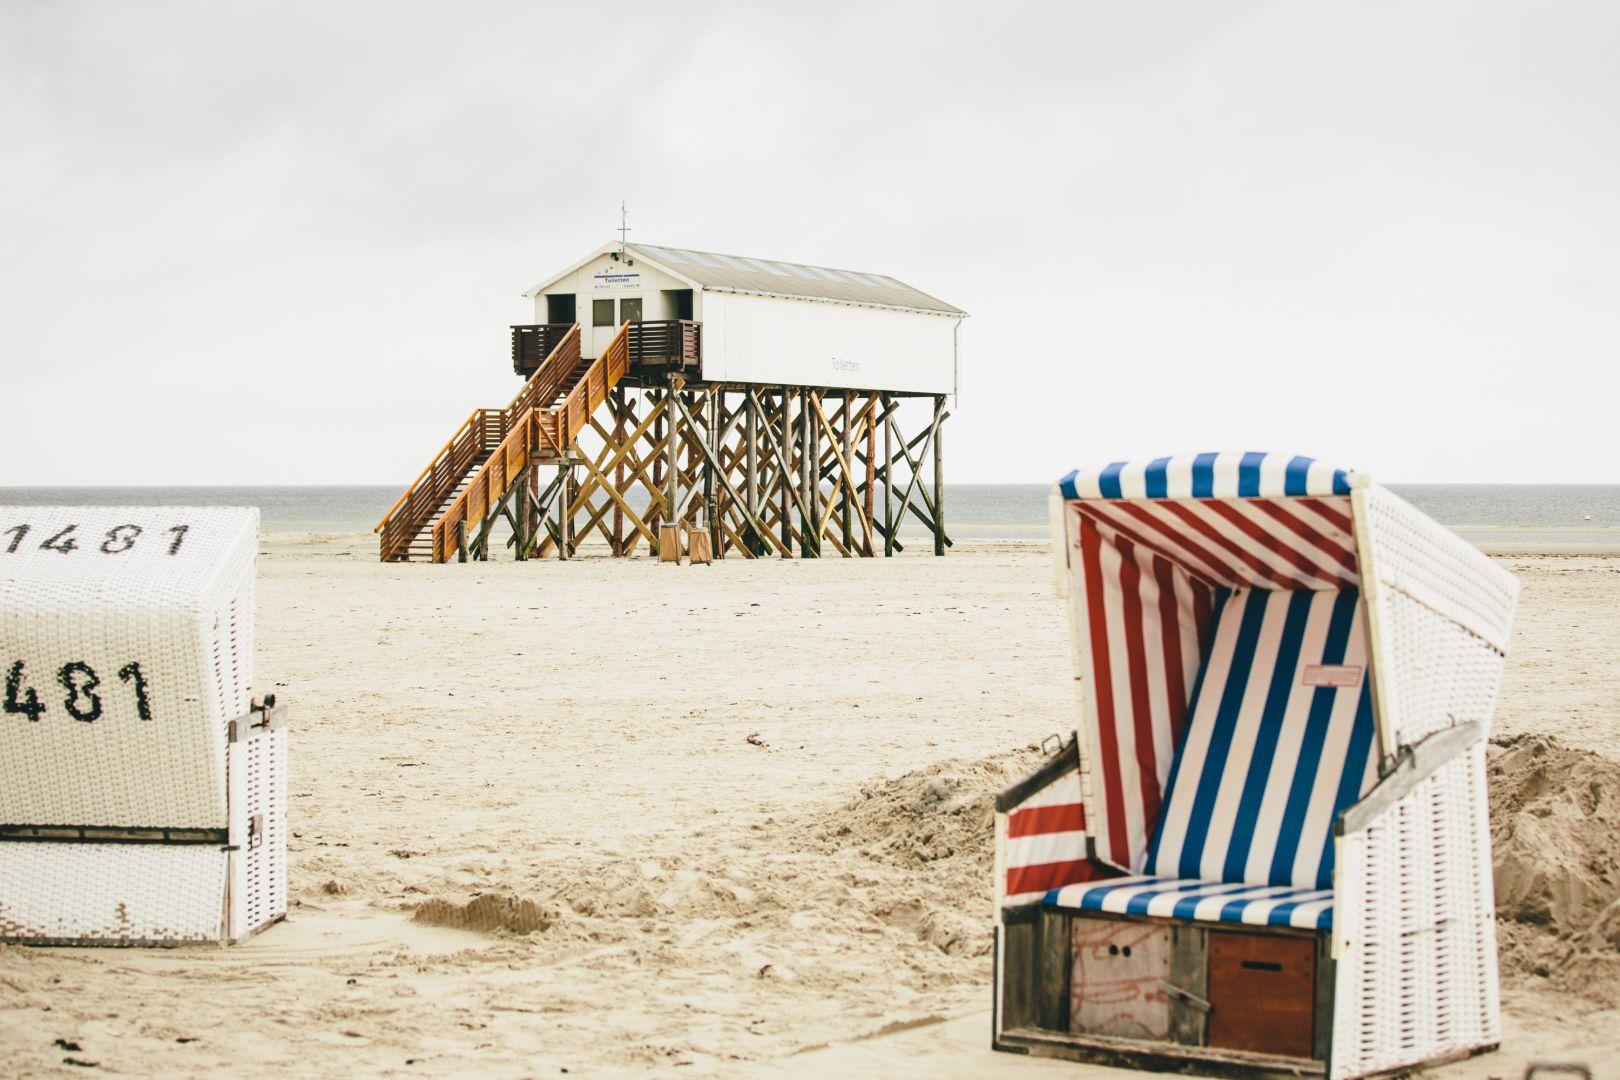 Nordsee hotel beach motel spo st peter ording for Designhotel nordsee